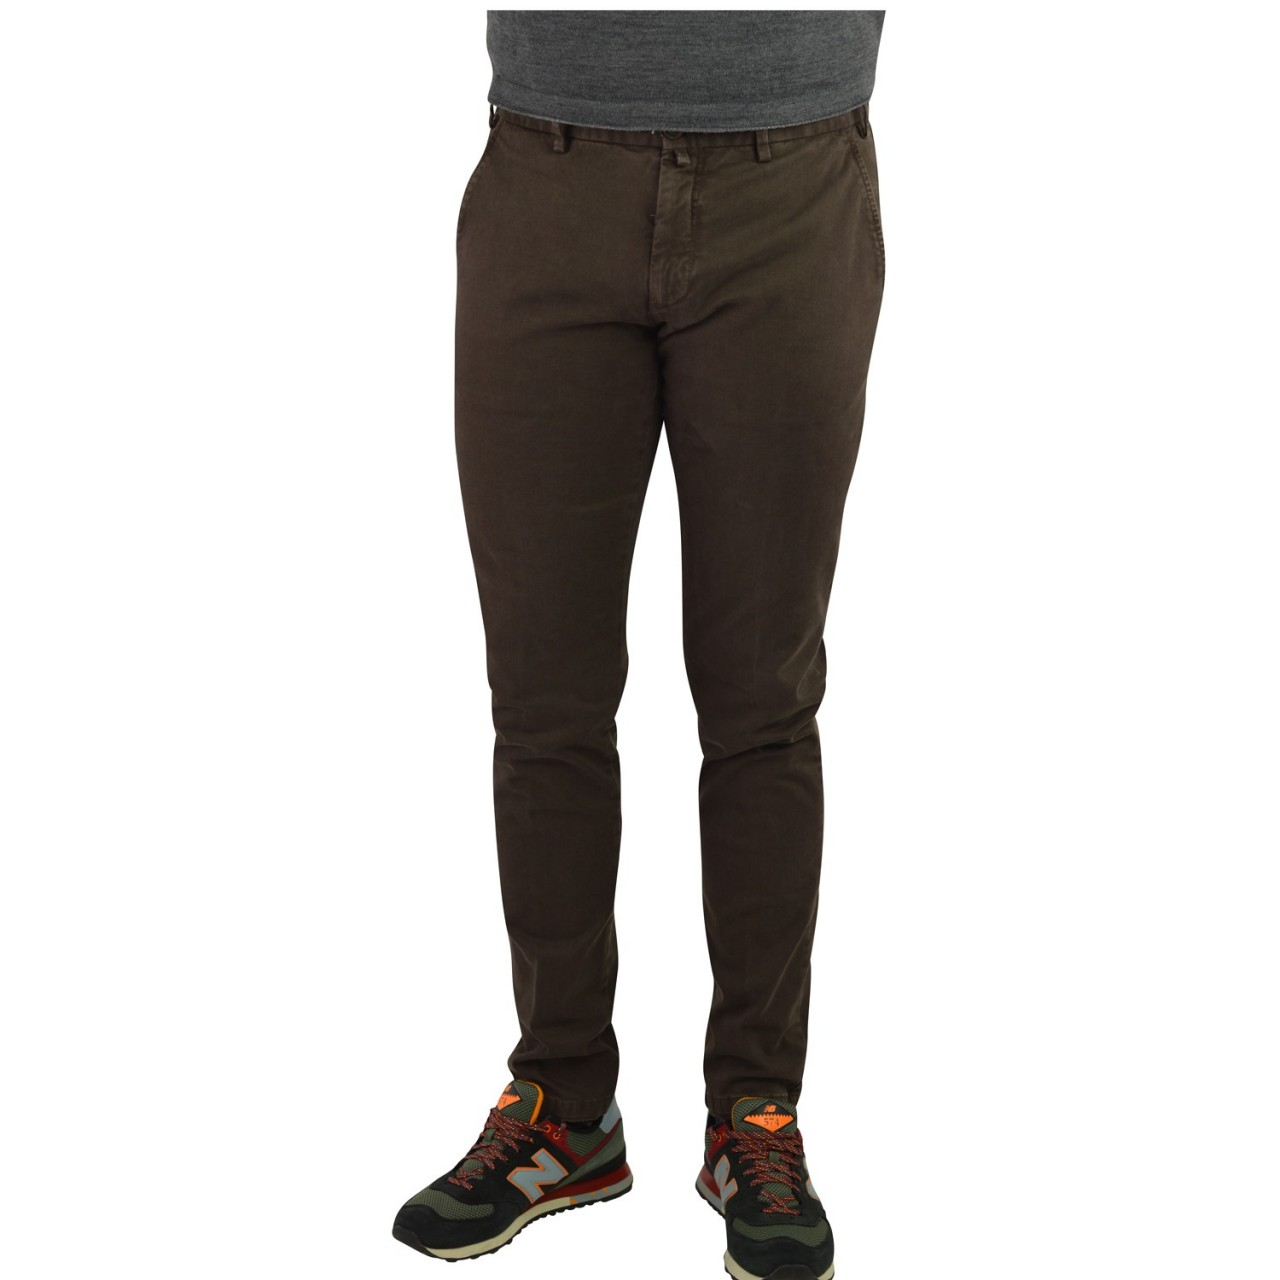 Verdera Uomo Pantalone Verdera Uomo Tessuto Invecchiato Tasca Amer 500137C